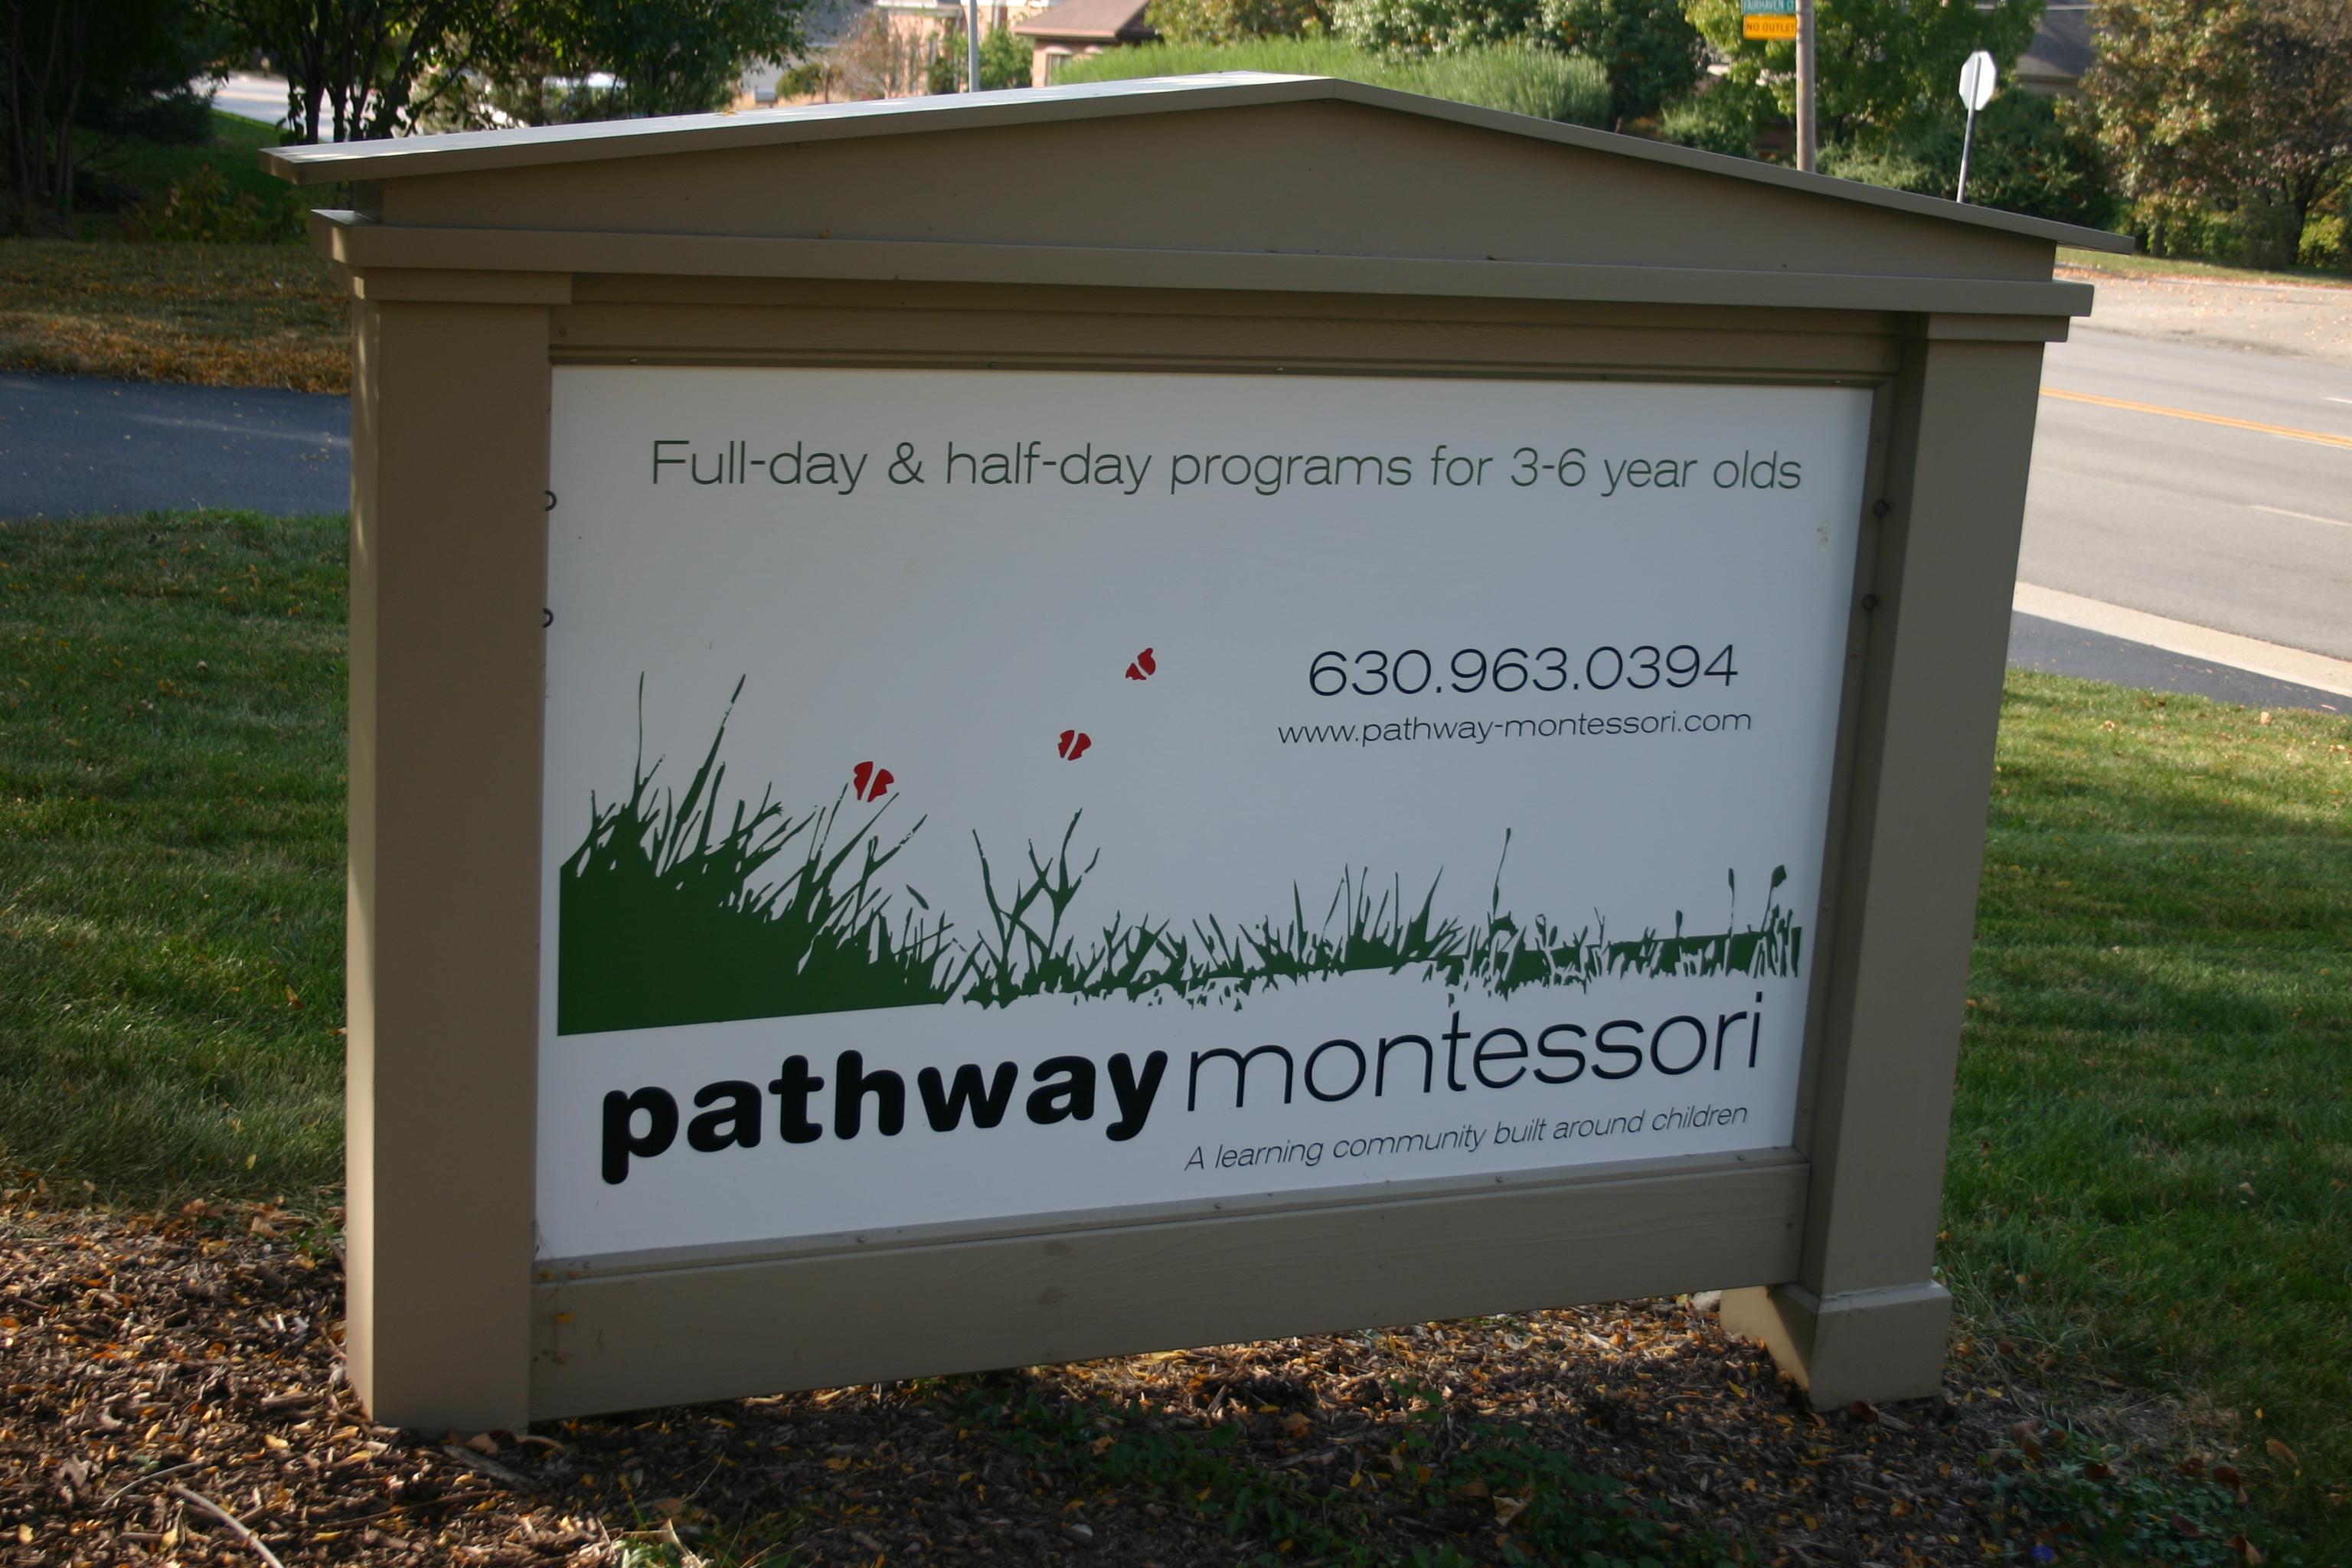 Pathway Montessori School